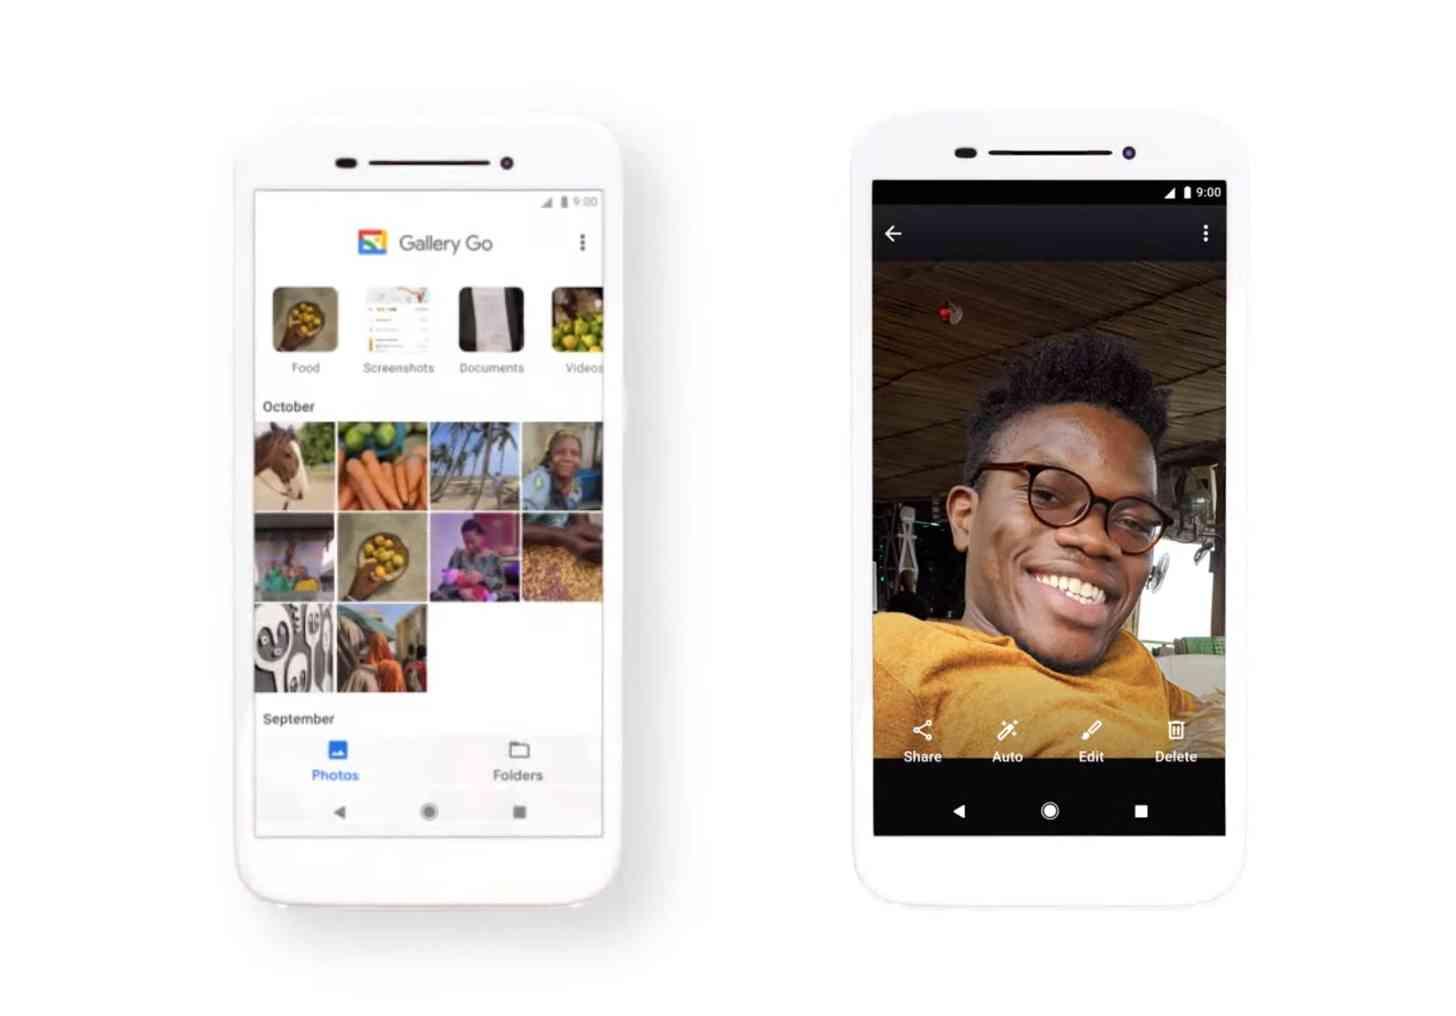 Google Gallery Go app screenshots